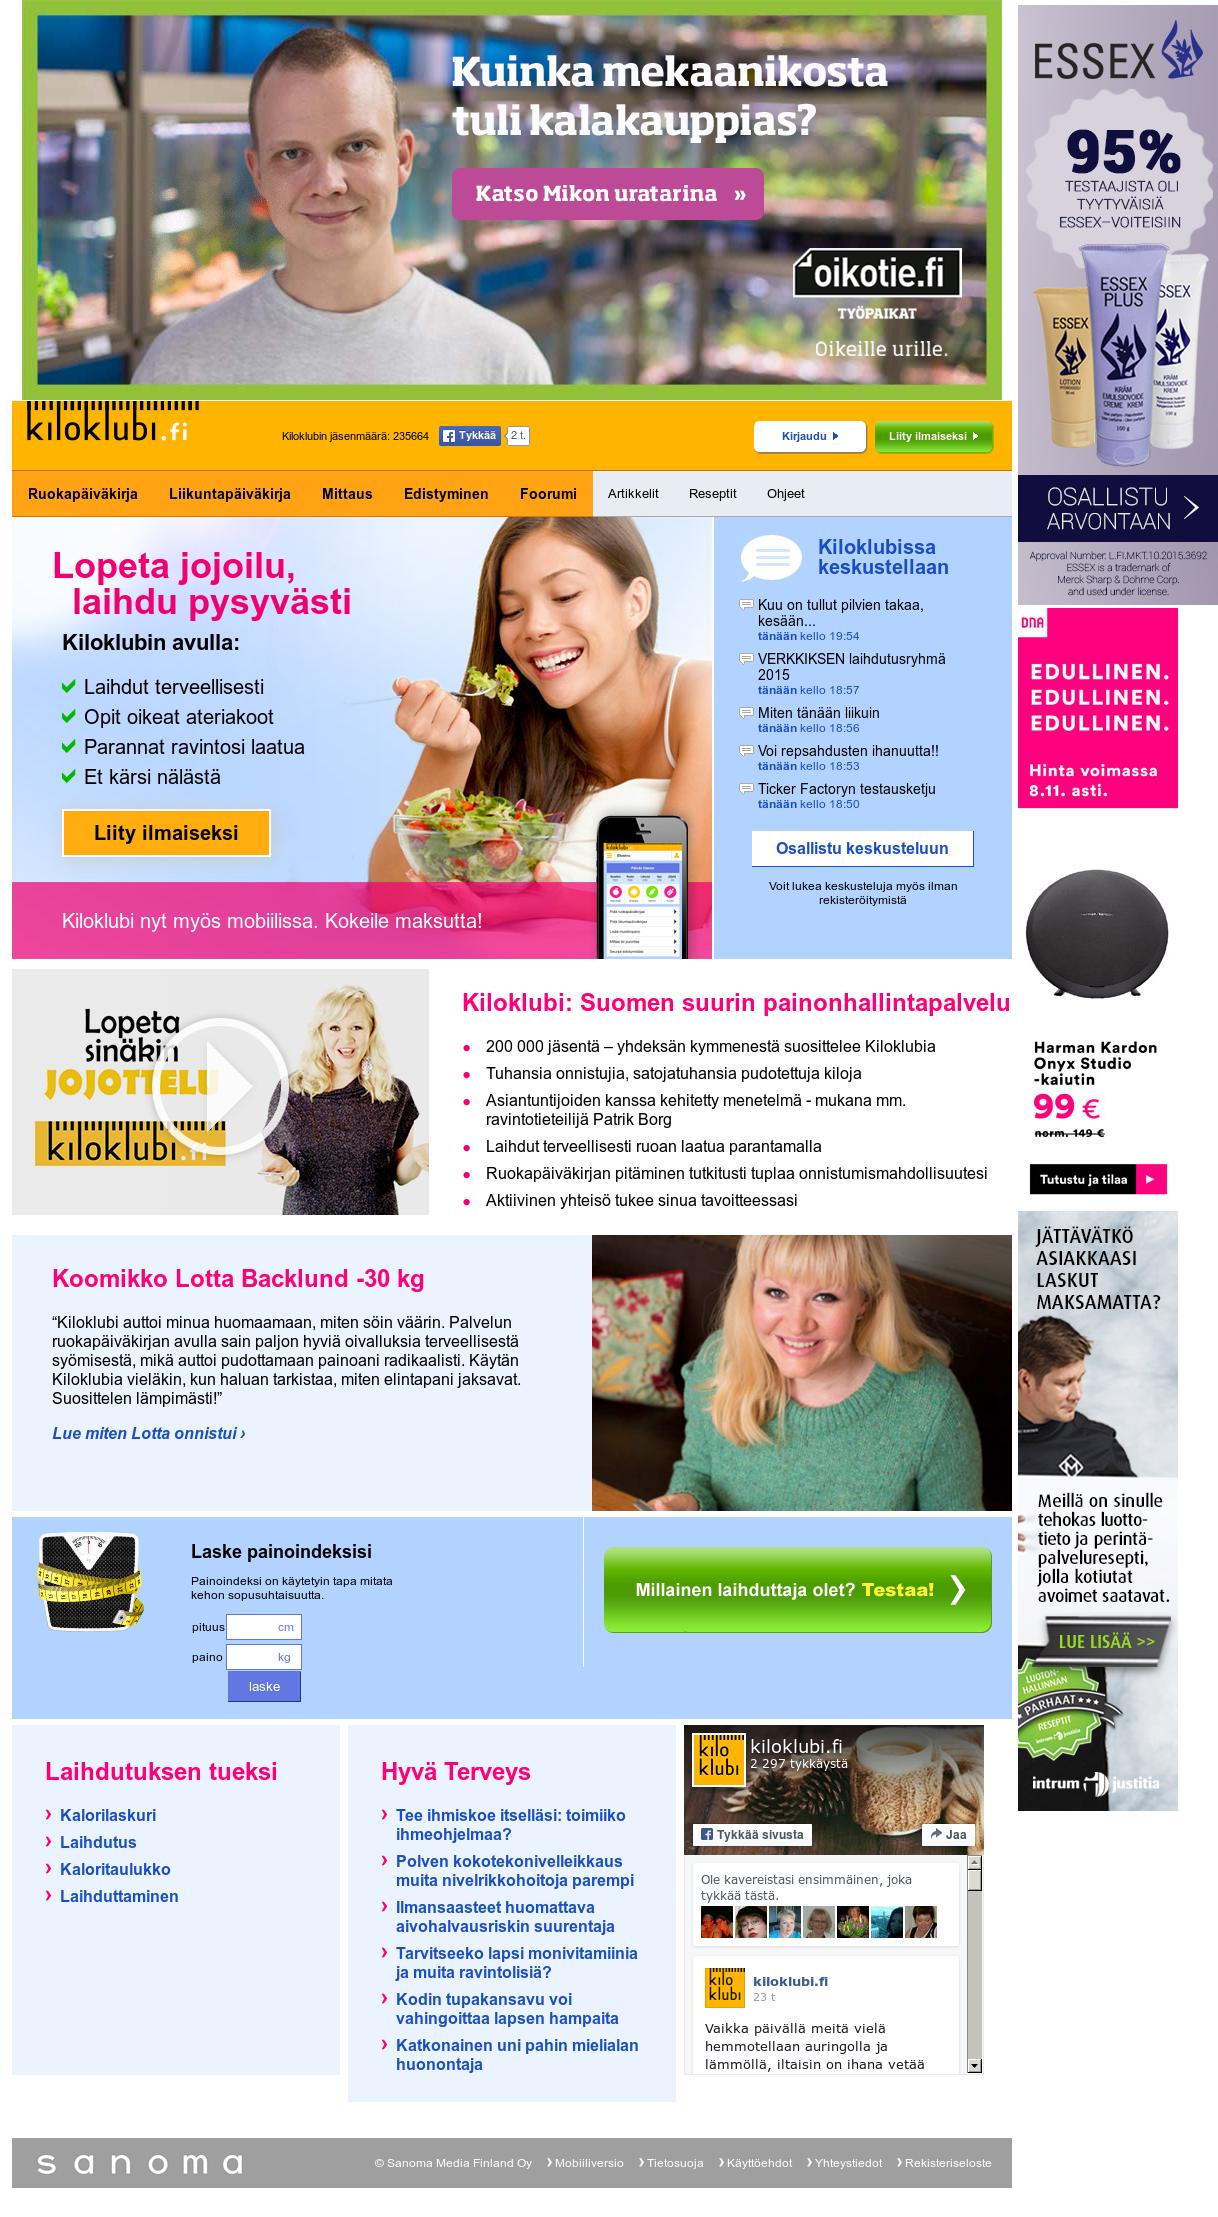 Tuplaa dating Website